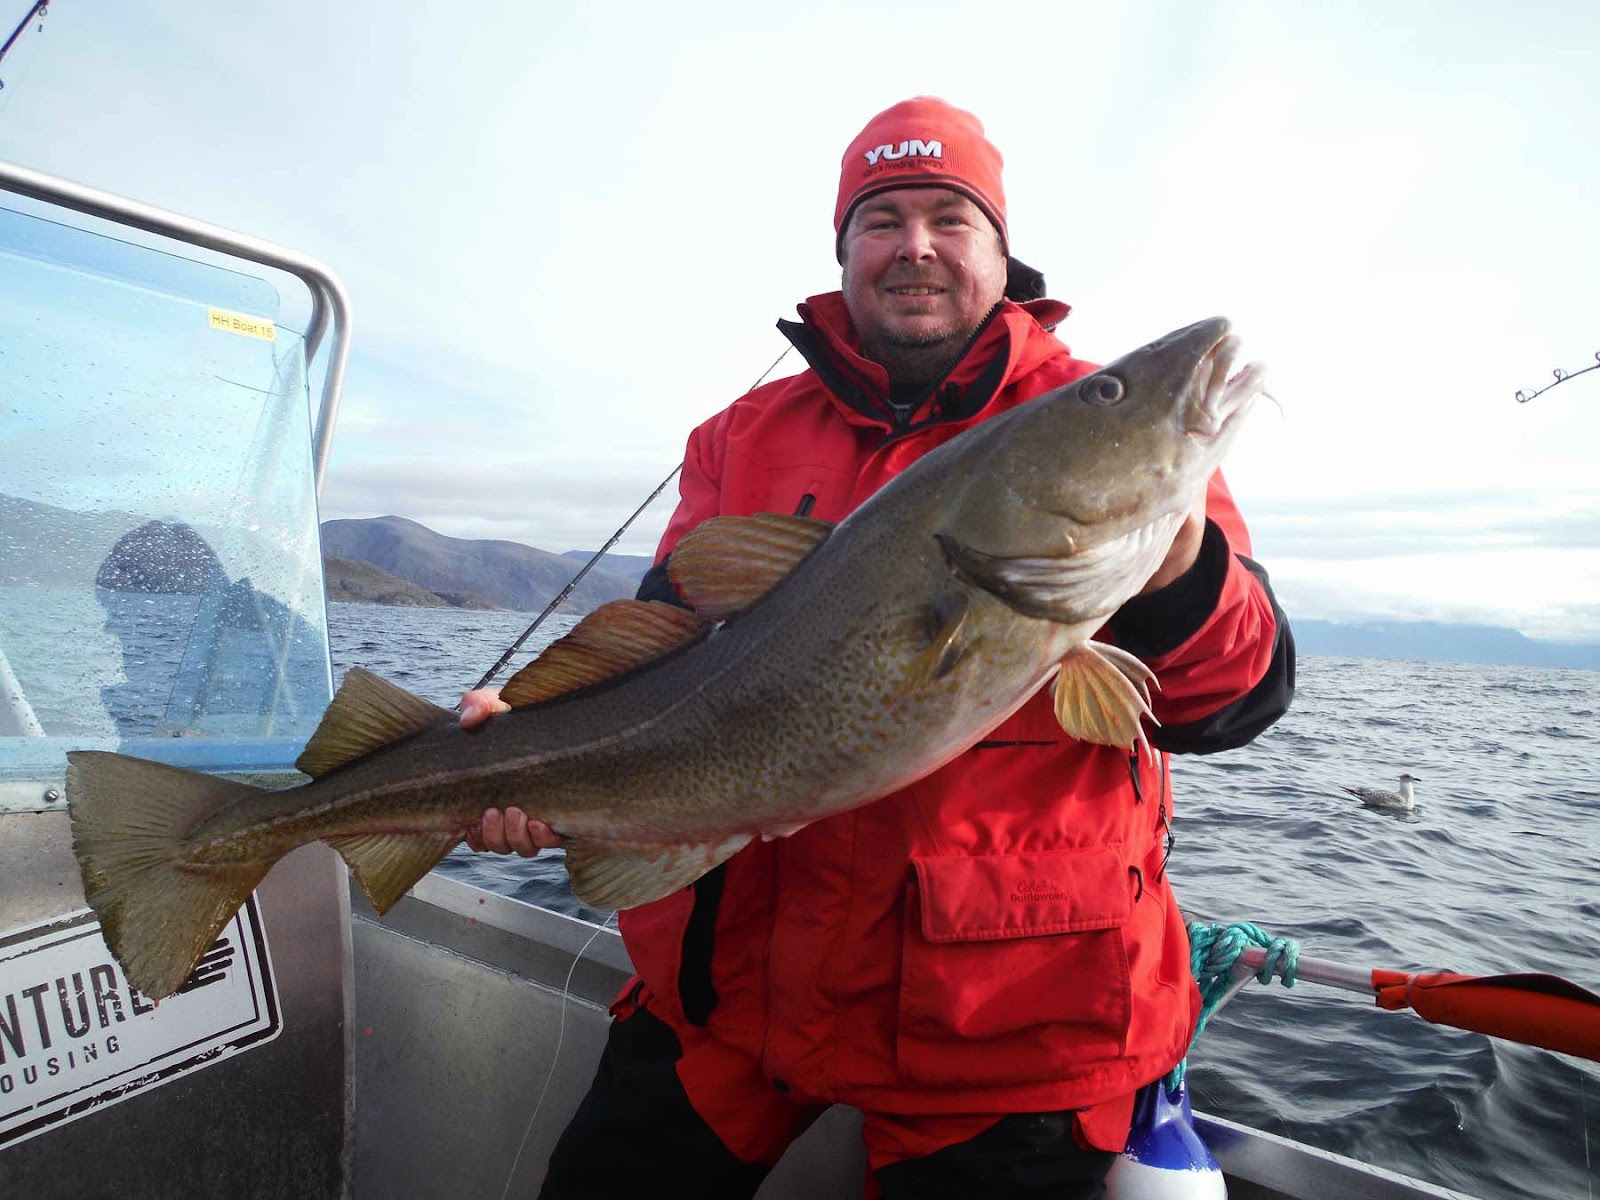 рыбалка в любую погоду